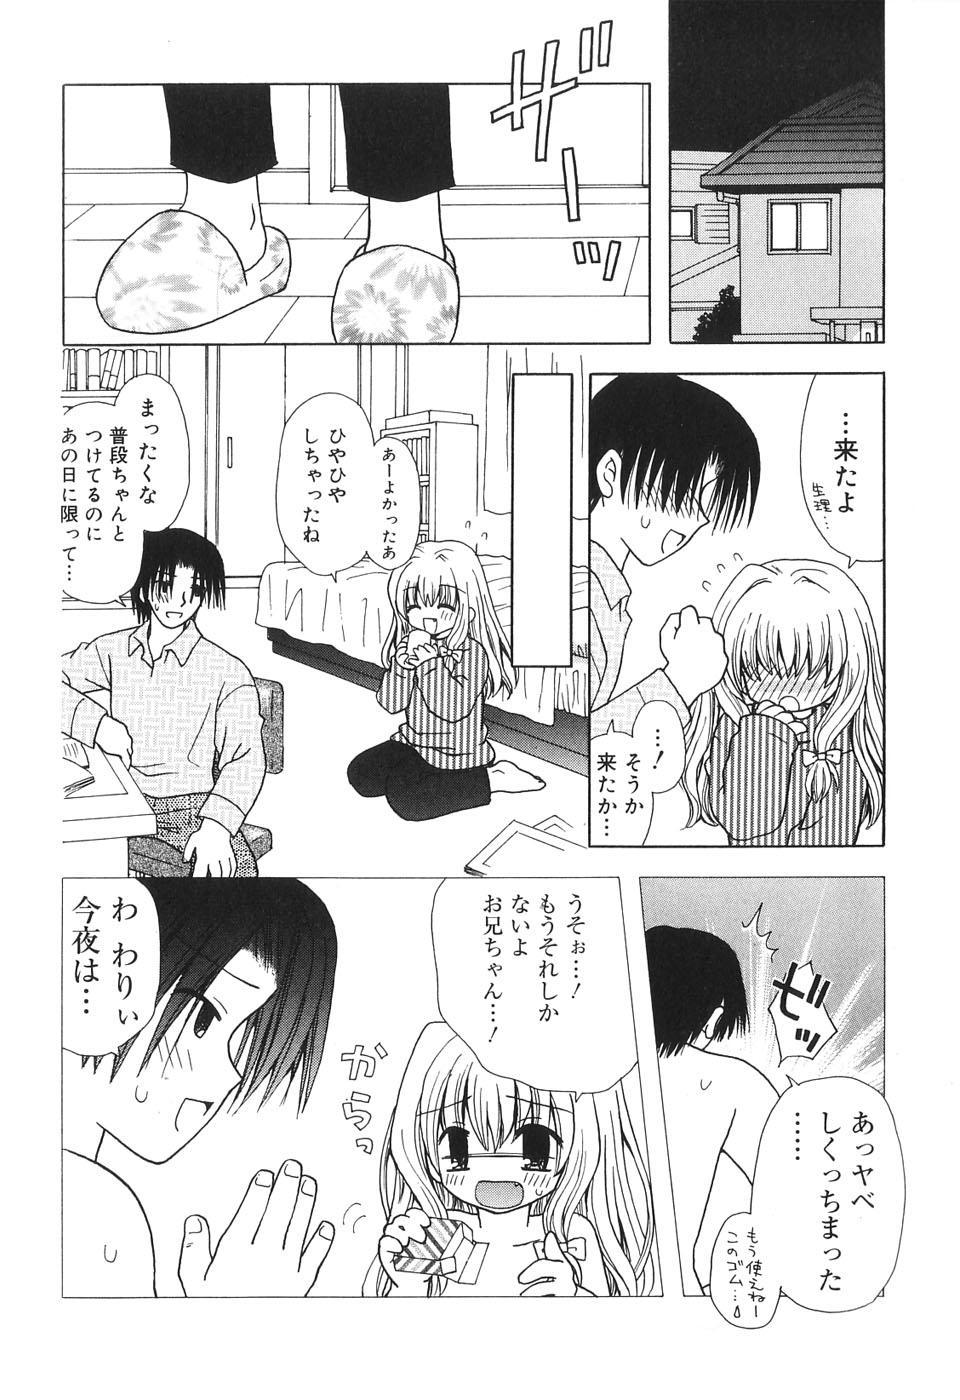 Musoubana 134